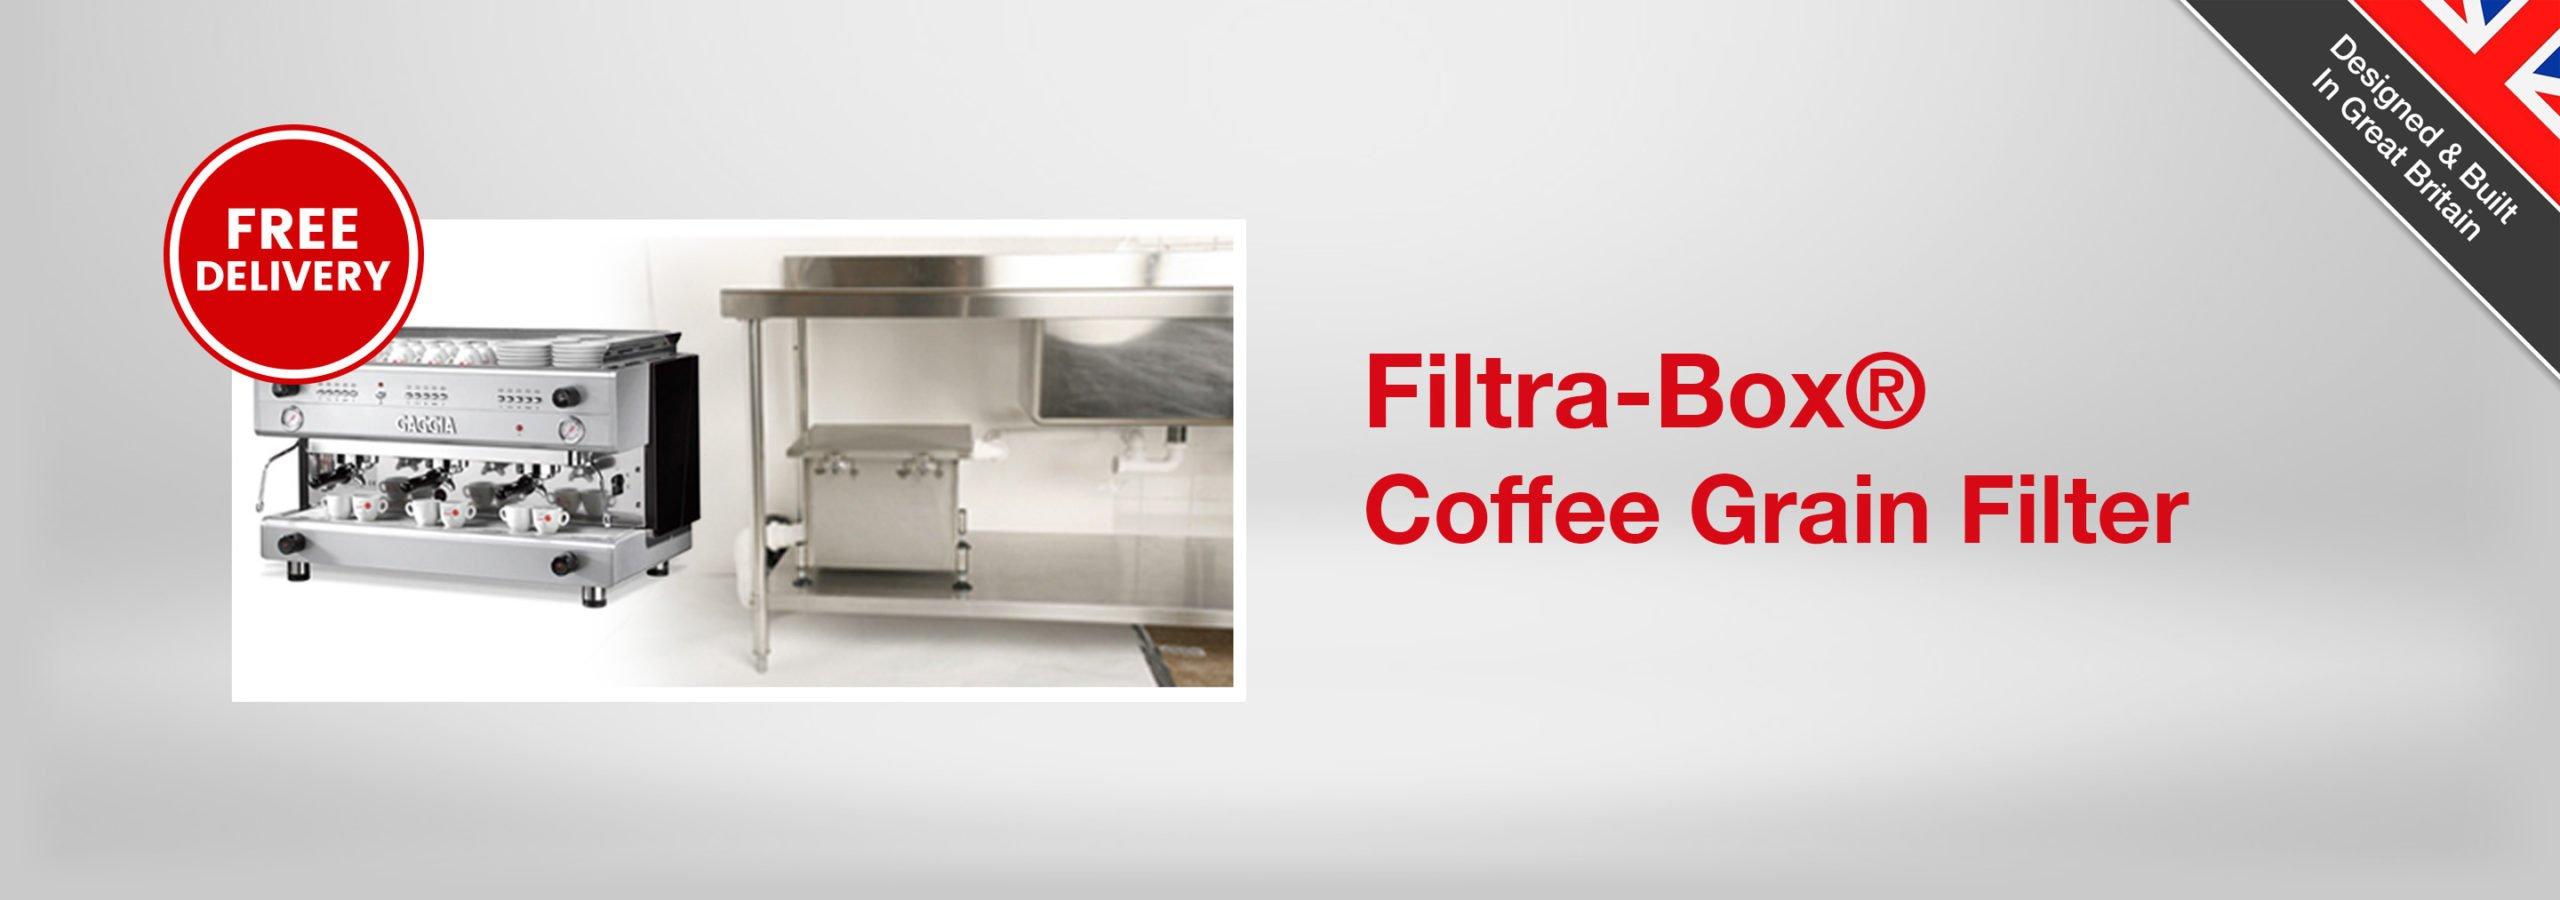 FiltraBox-1